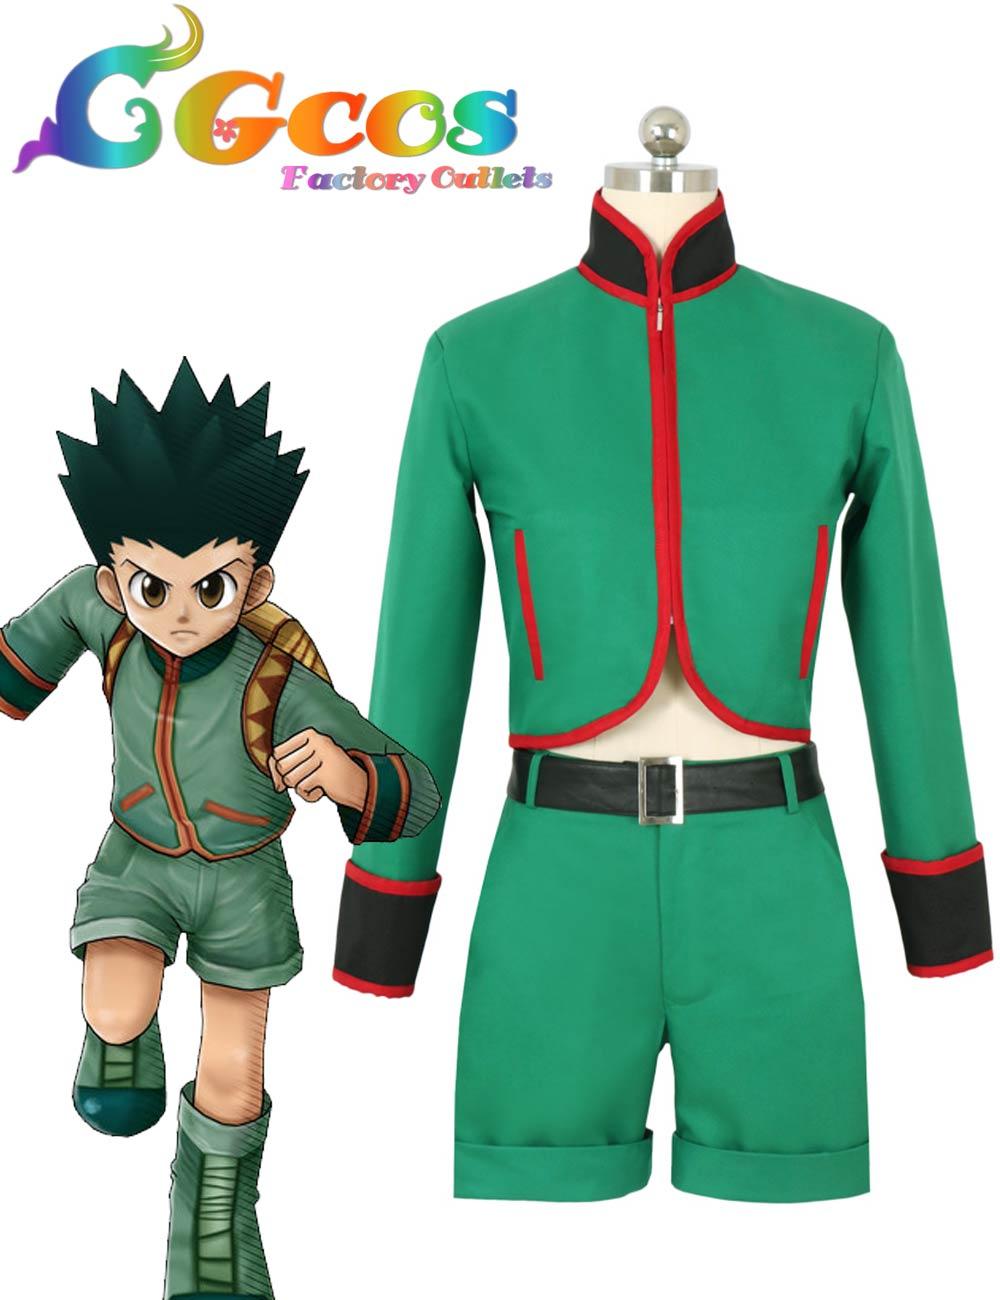 CGCOS Express! Cosplay Costume Hunter X Hunter Gon Freecss Custom-made Retail/Wholesale Halloween Christmas Party Uniform